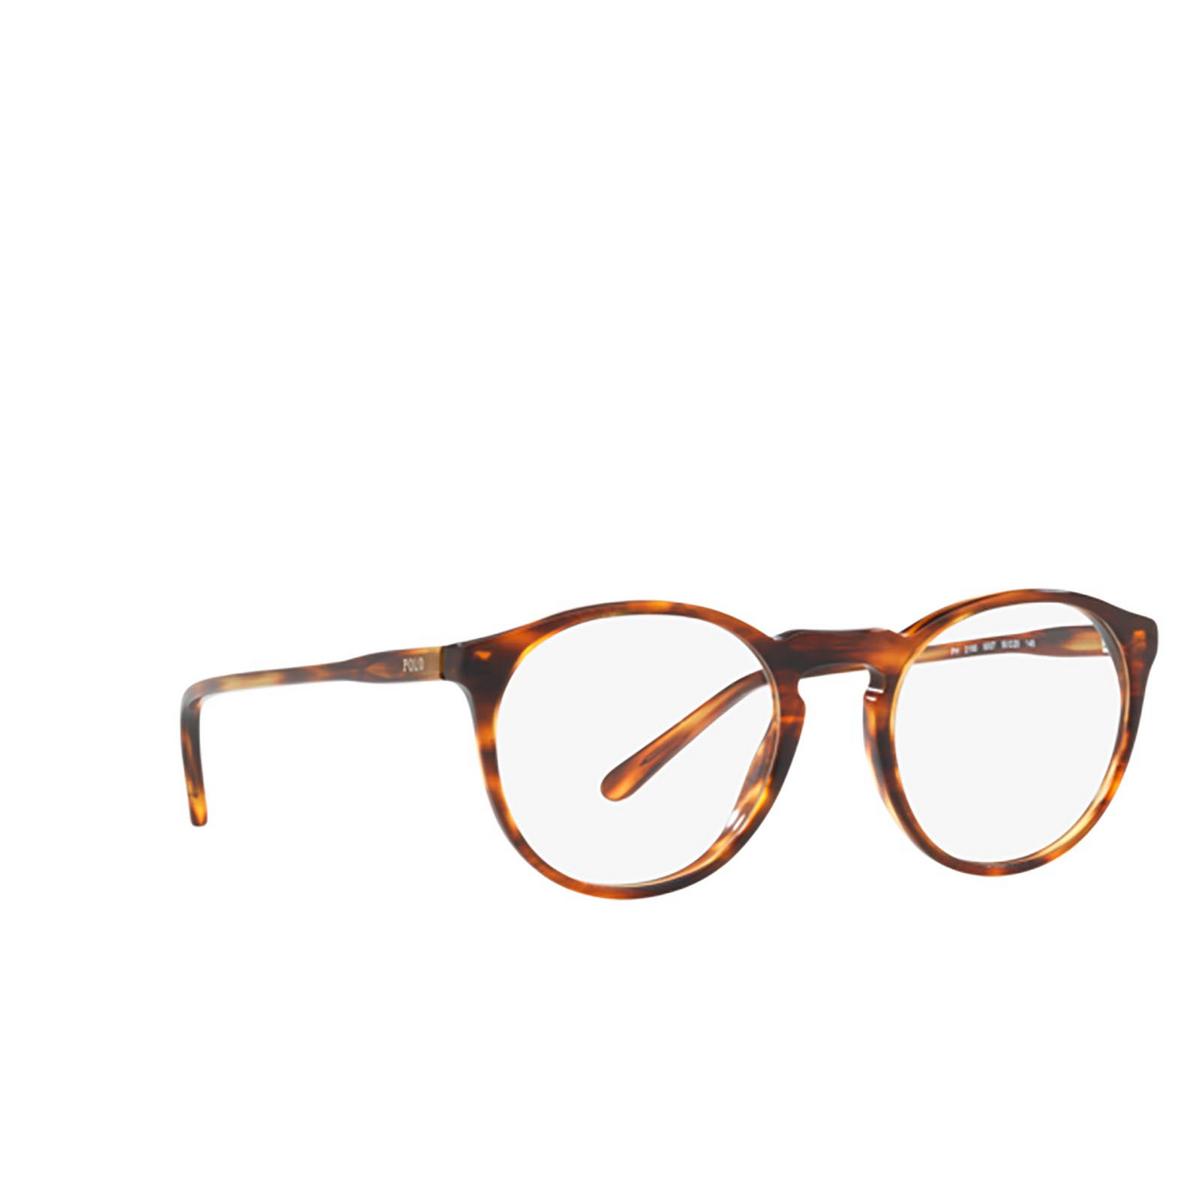 Polo Ralph Lauren® Round Eyeglasses: PH2180 color Shiny Striped Havana 5007 - three-quarters view.